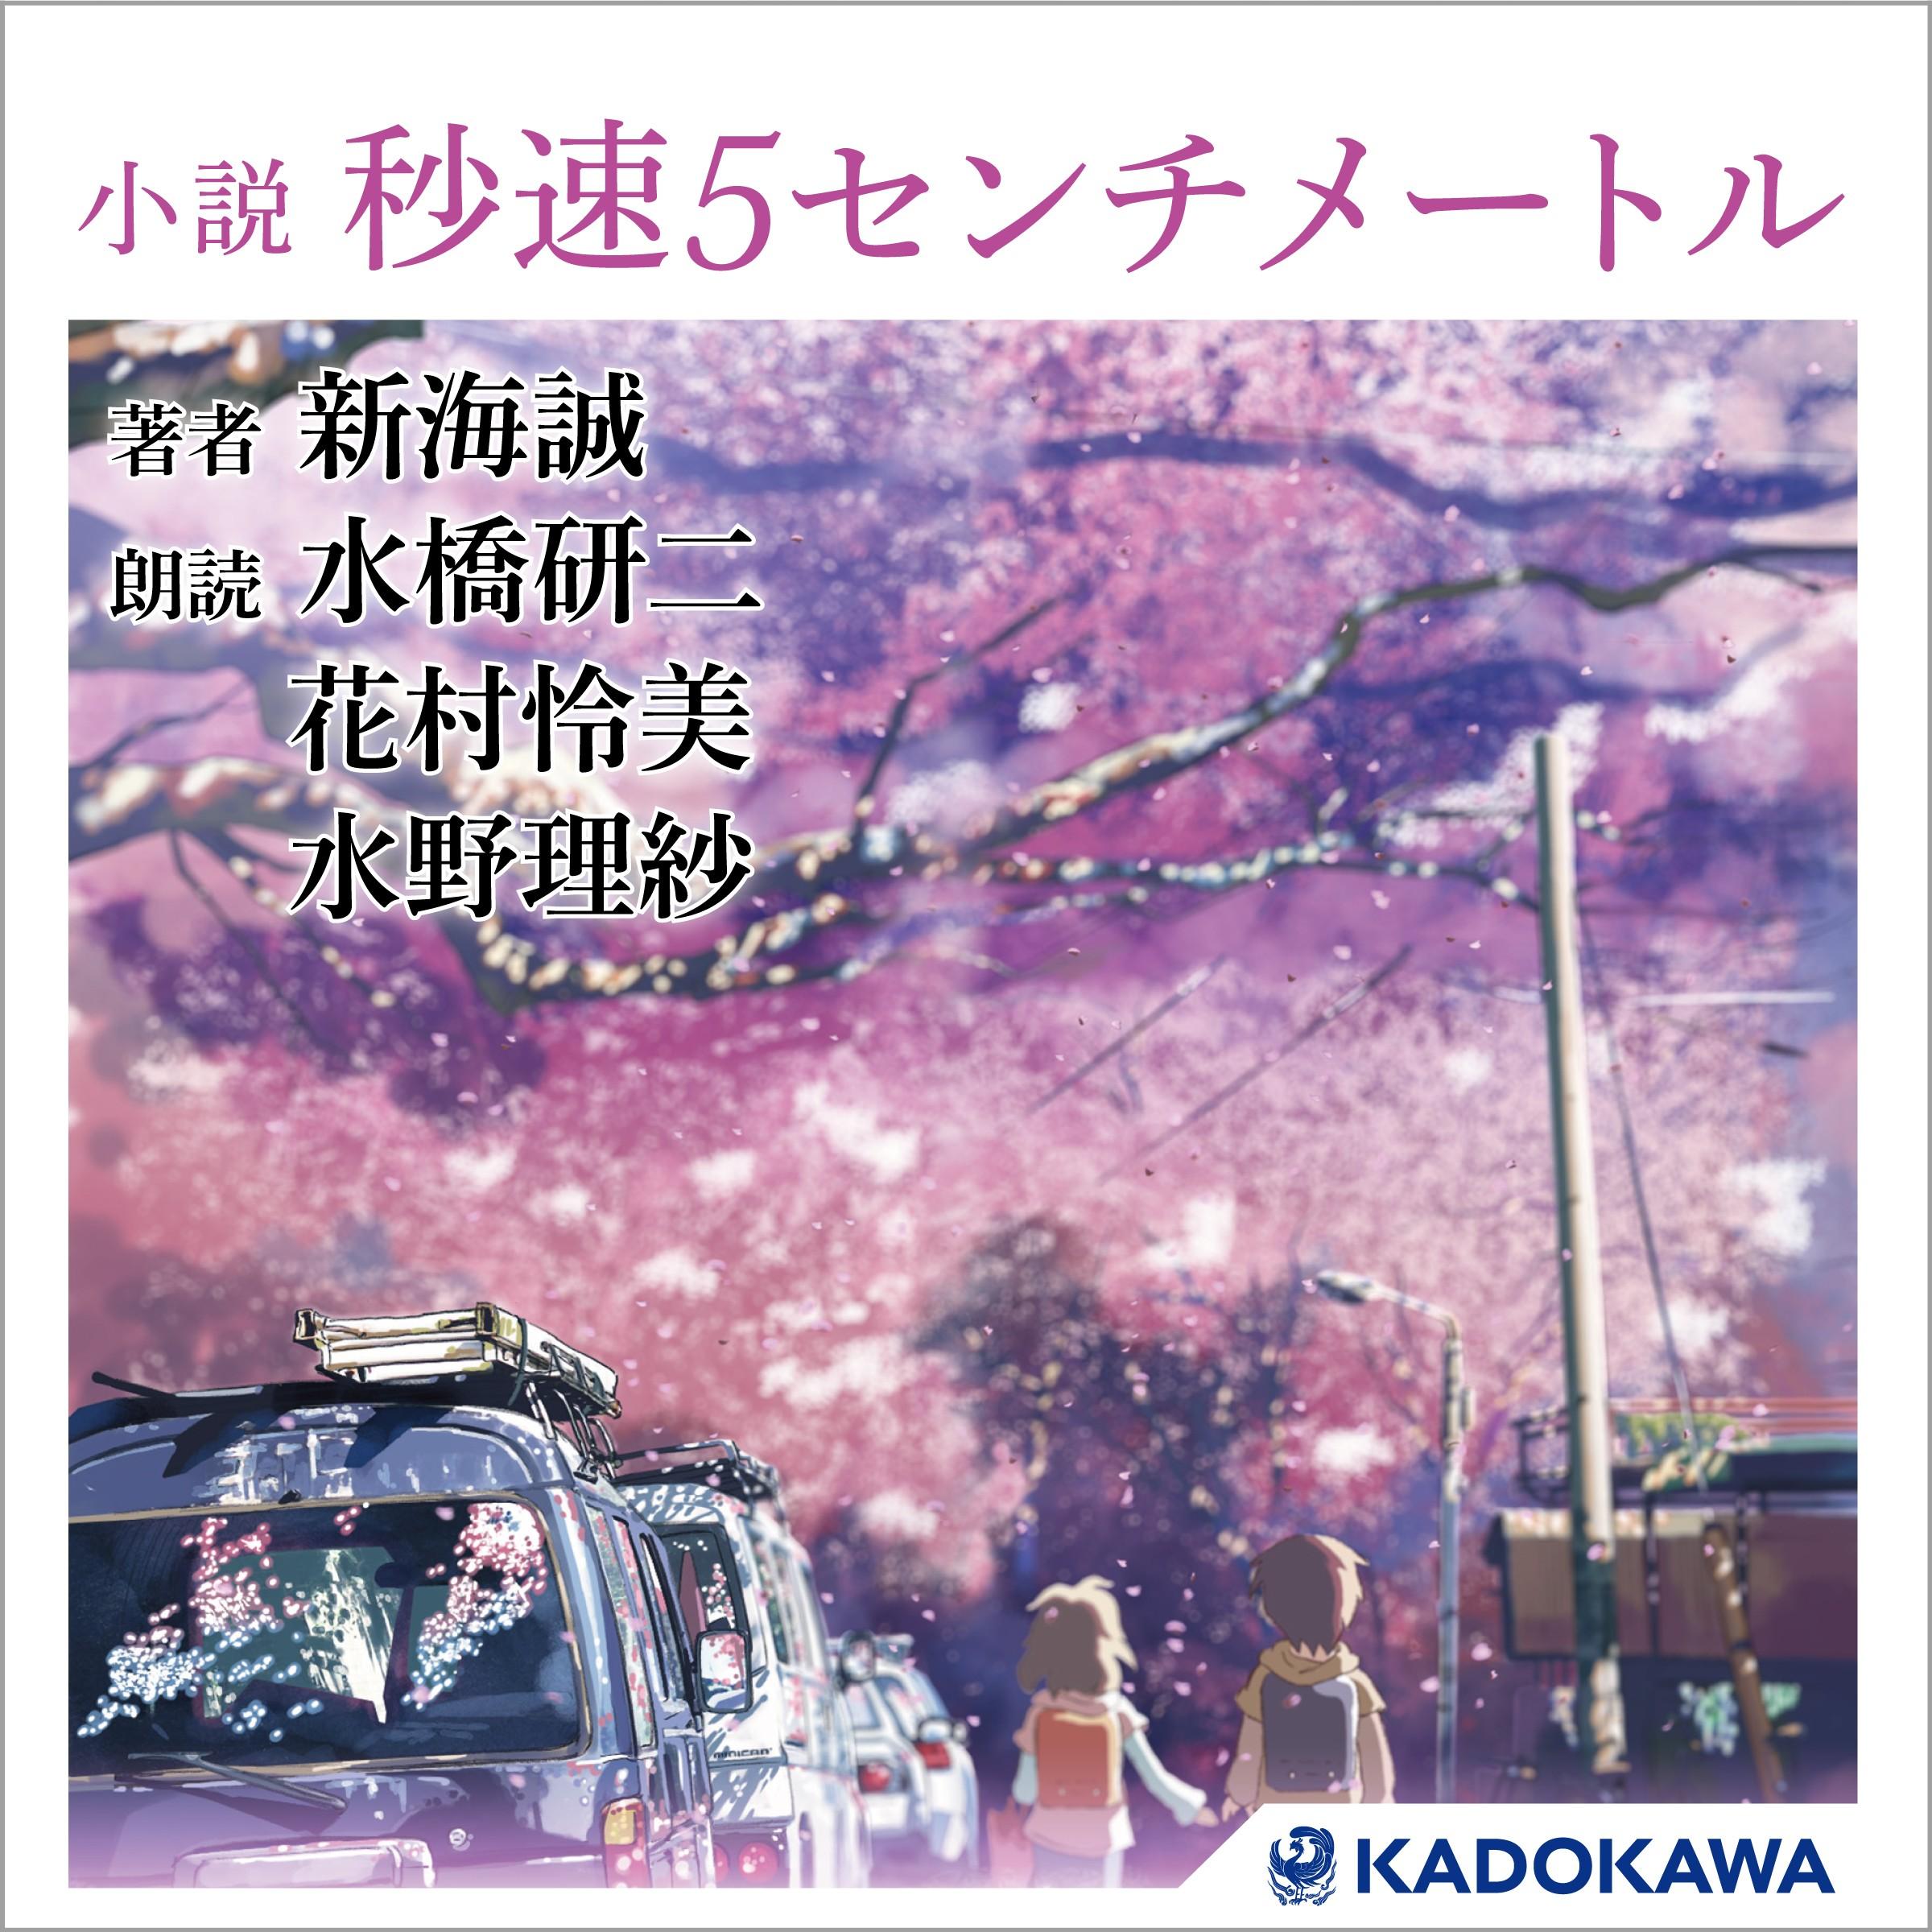 Audible_JP_ShinkaiMakoto